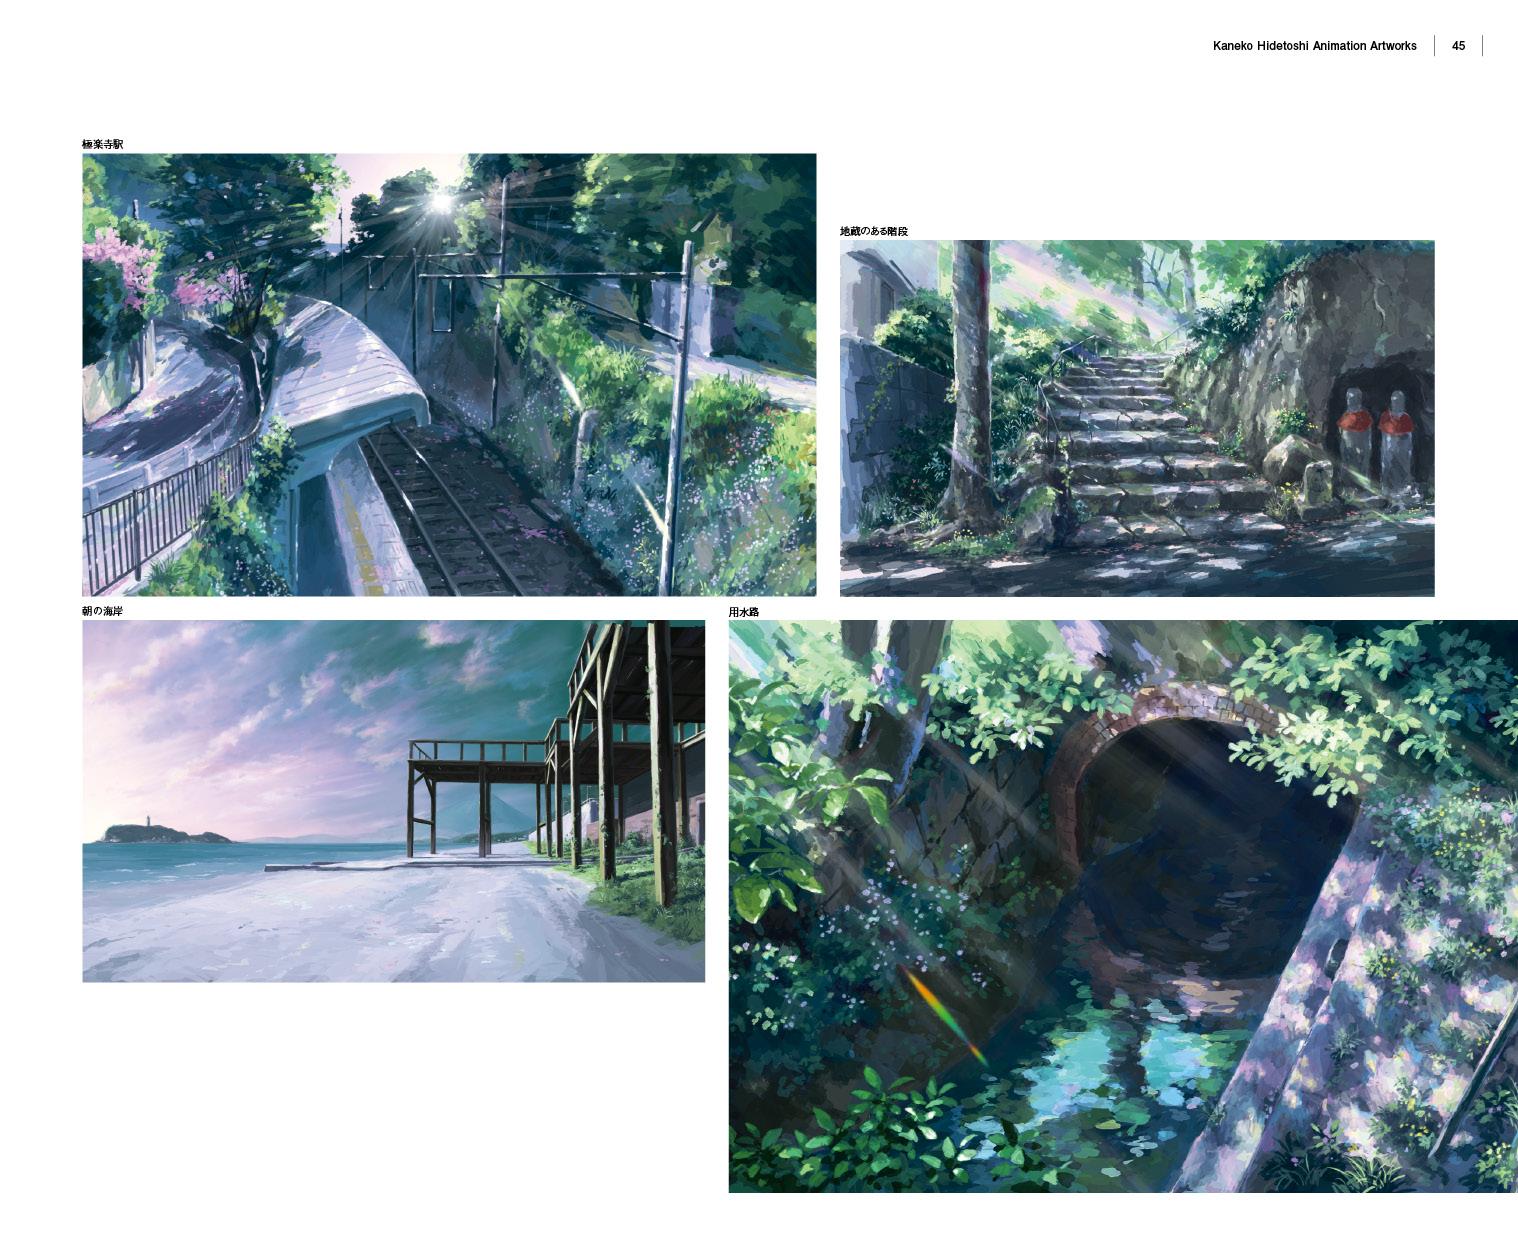 0726_kaneko_gashuu6.jpg